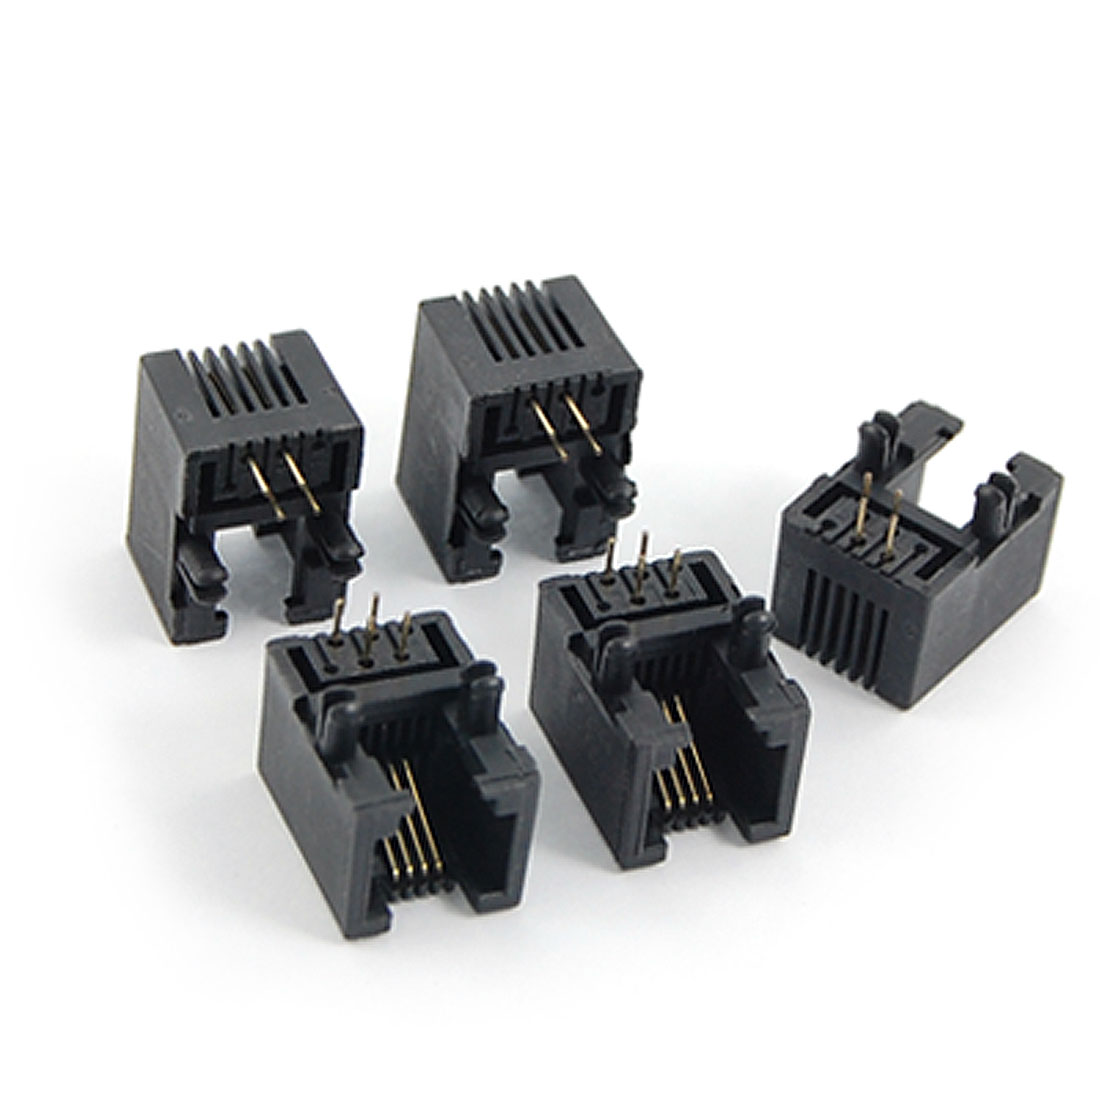 6P4C 4 Pin RJ11 Telephone Modular Jack PCB Contectors 5 Pcs